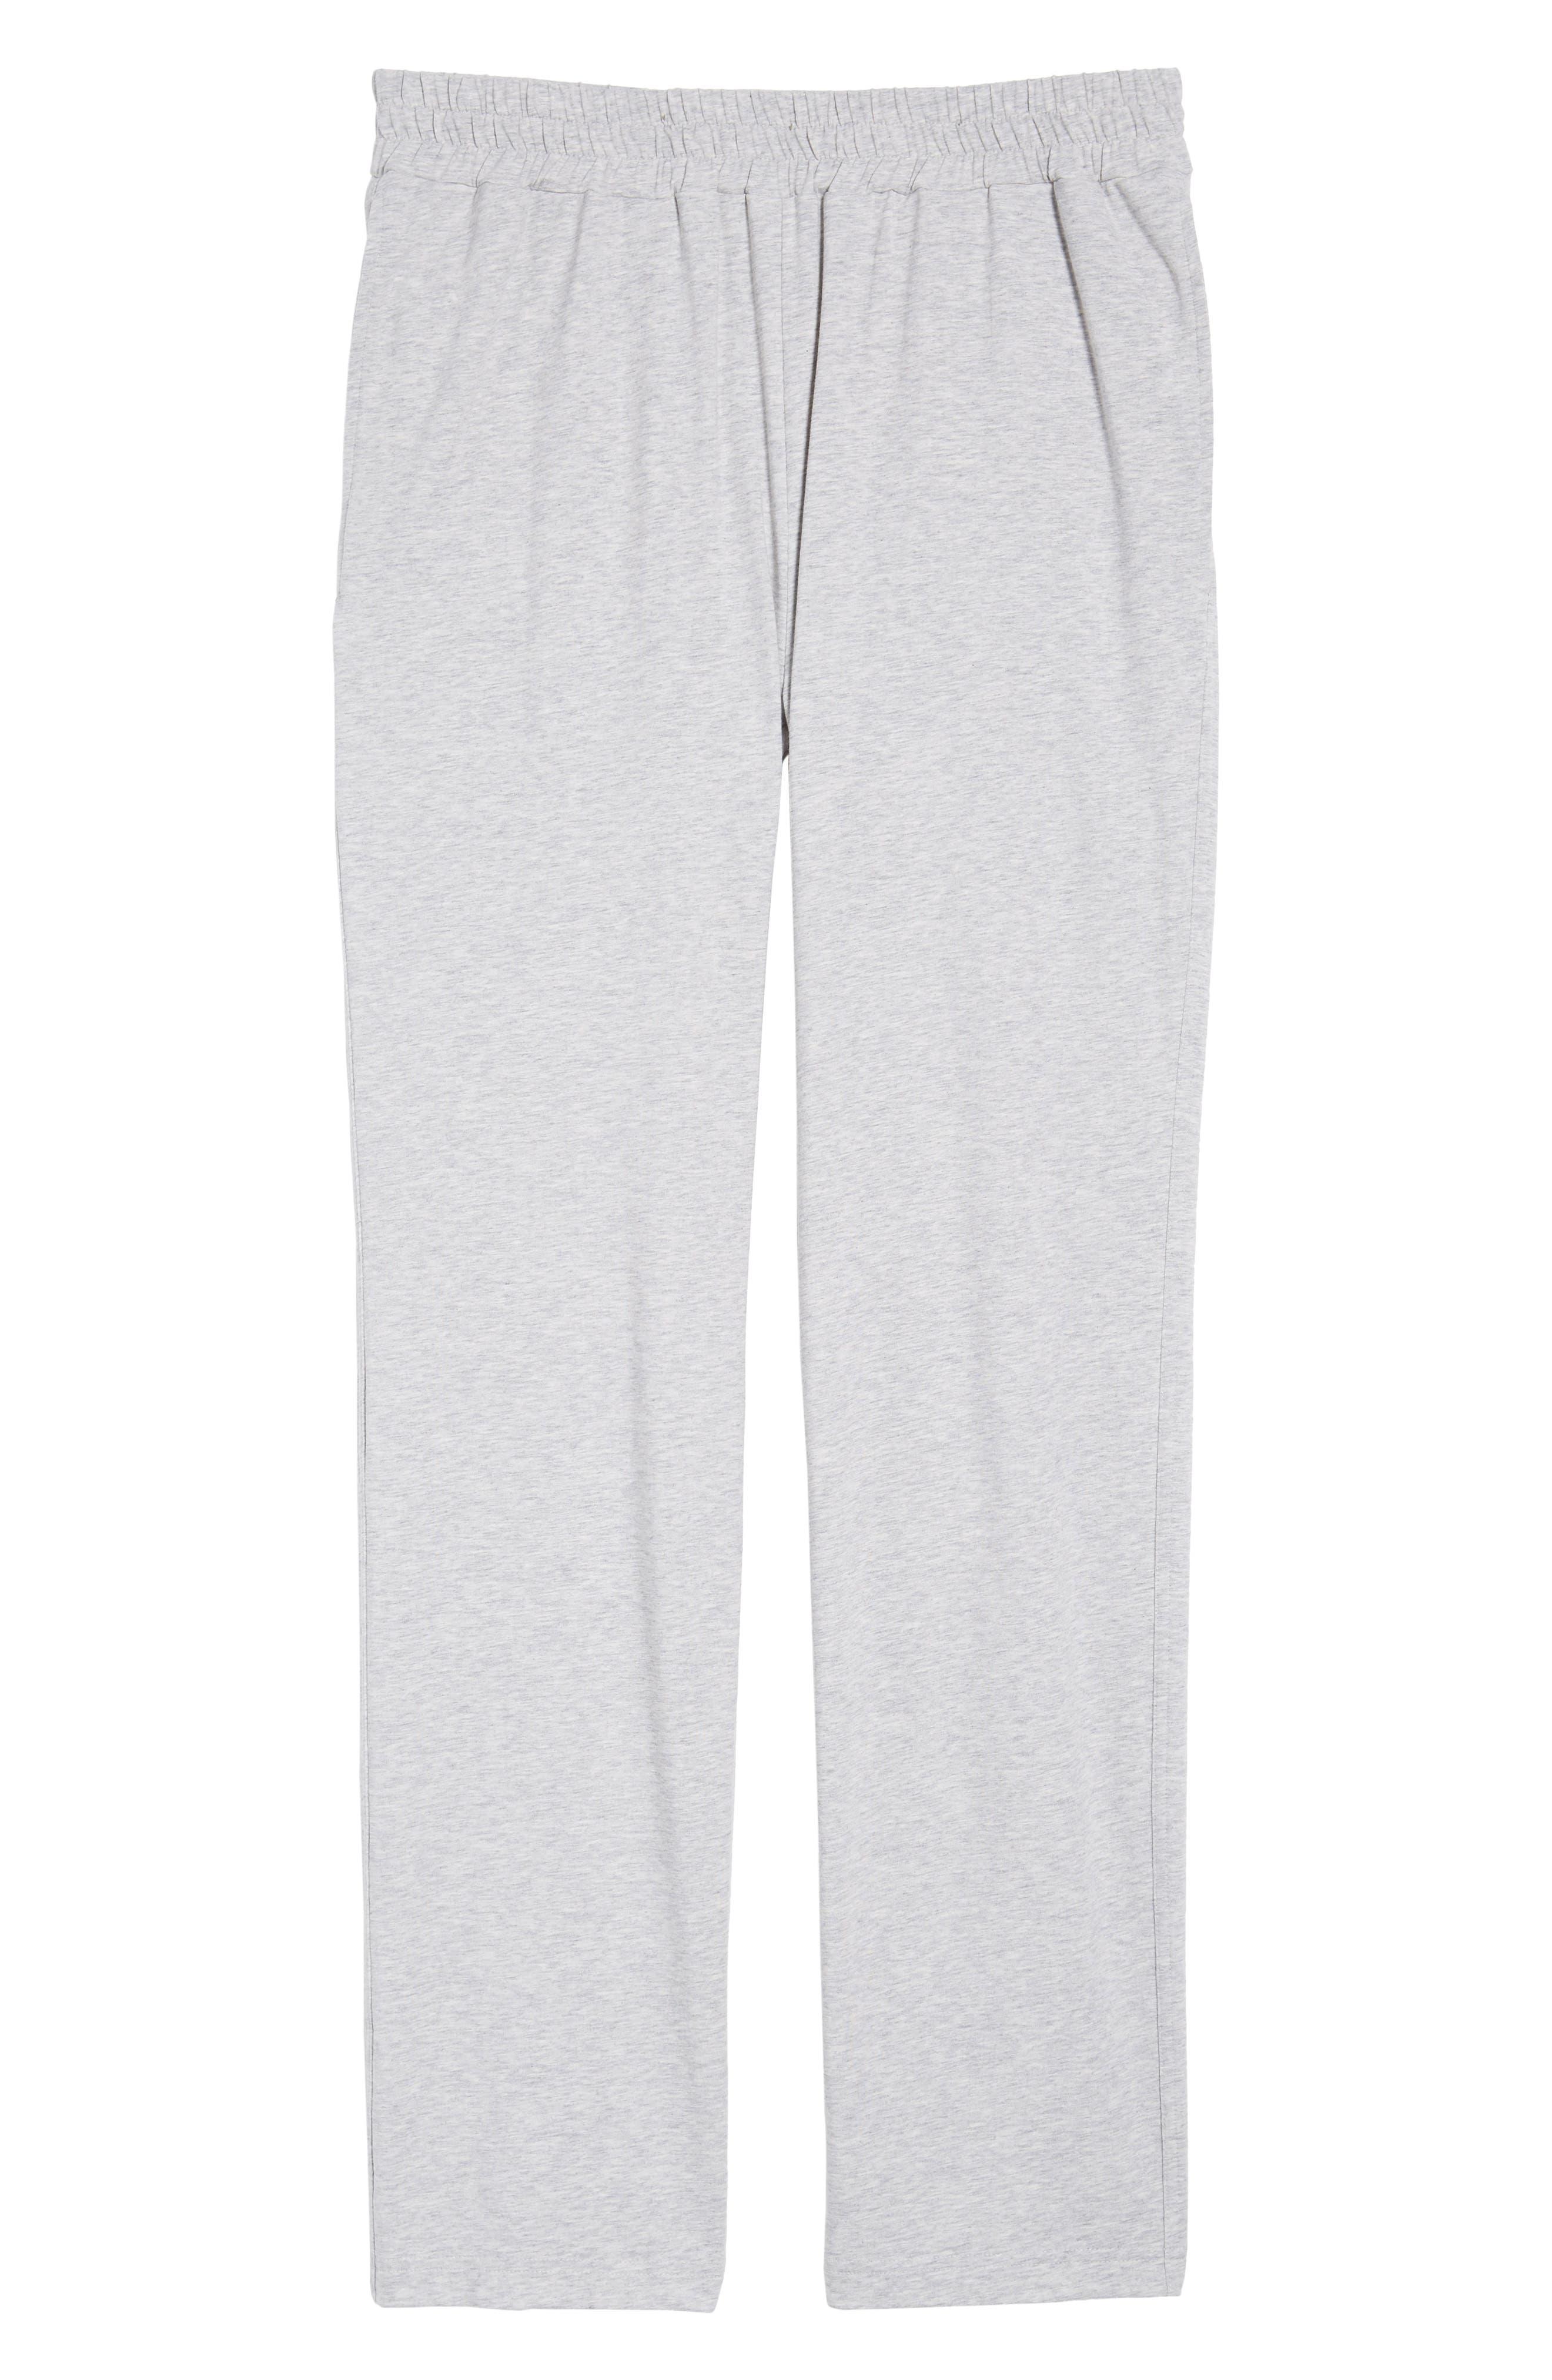 Classic Liquid Cotton Stretch Pants,                             Alternate thumbnail 6, color,                             HEATHER GREY